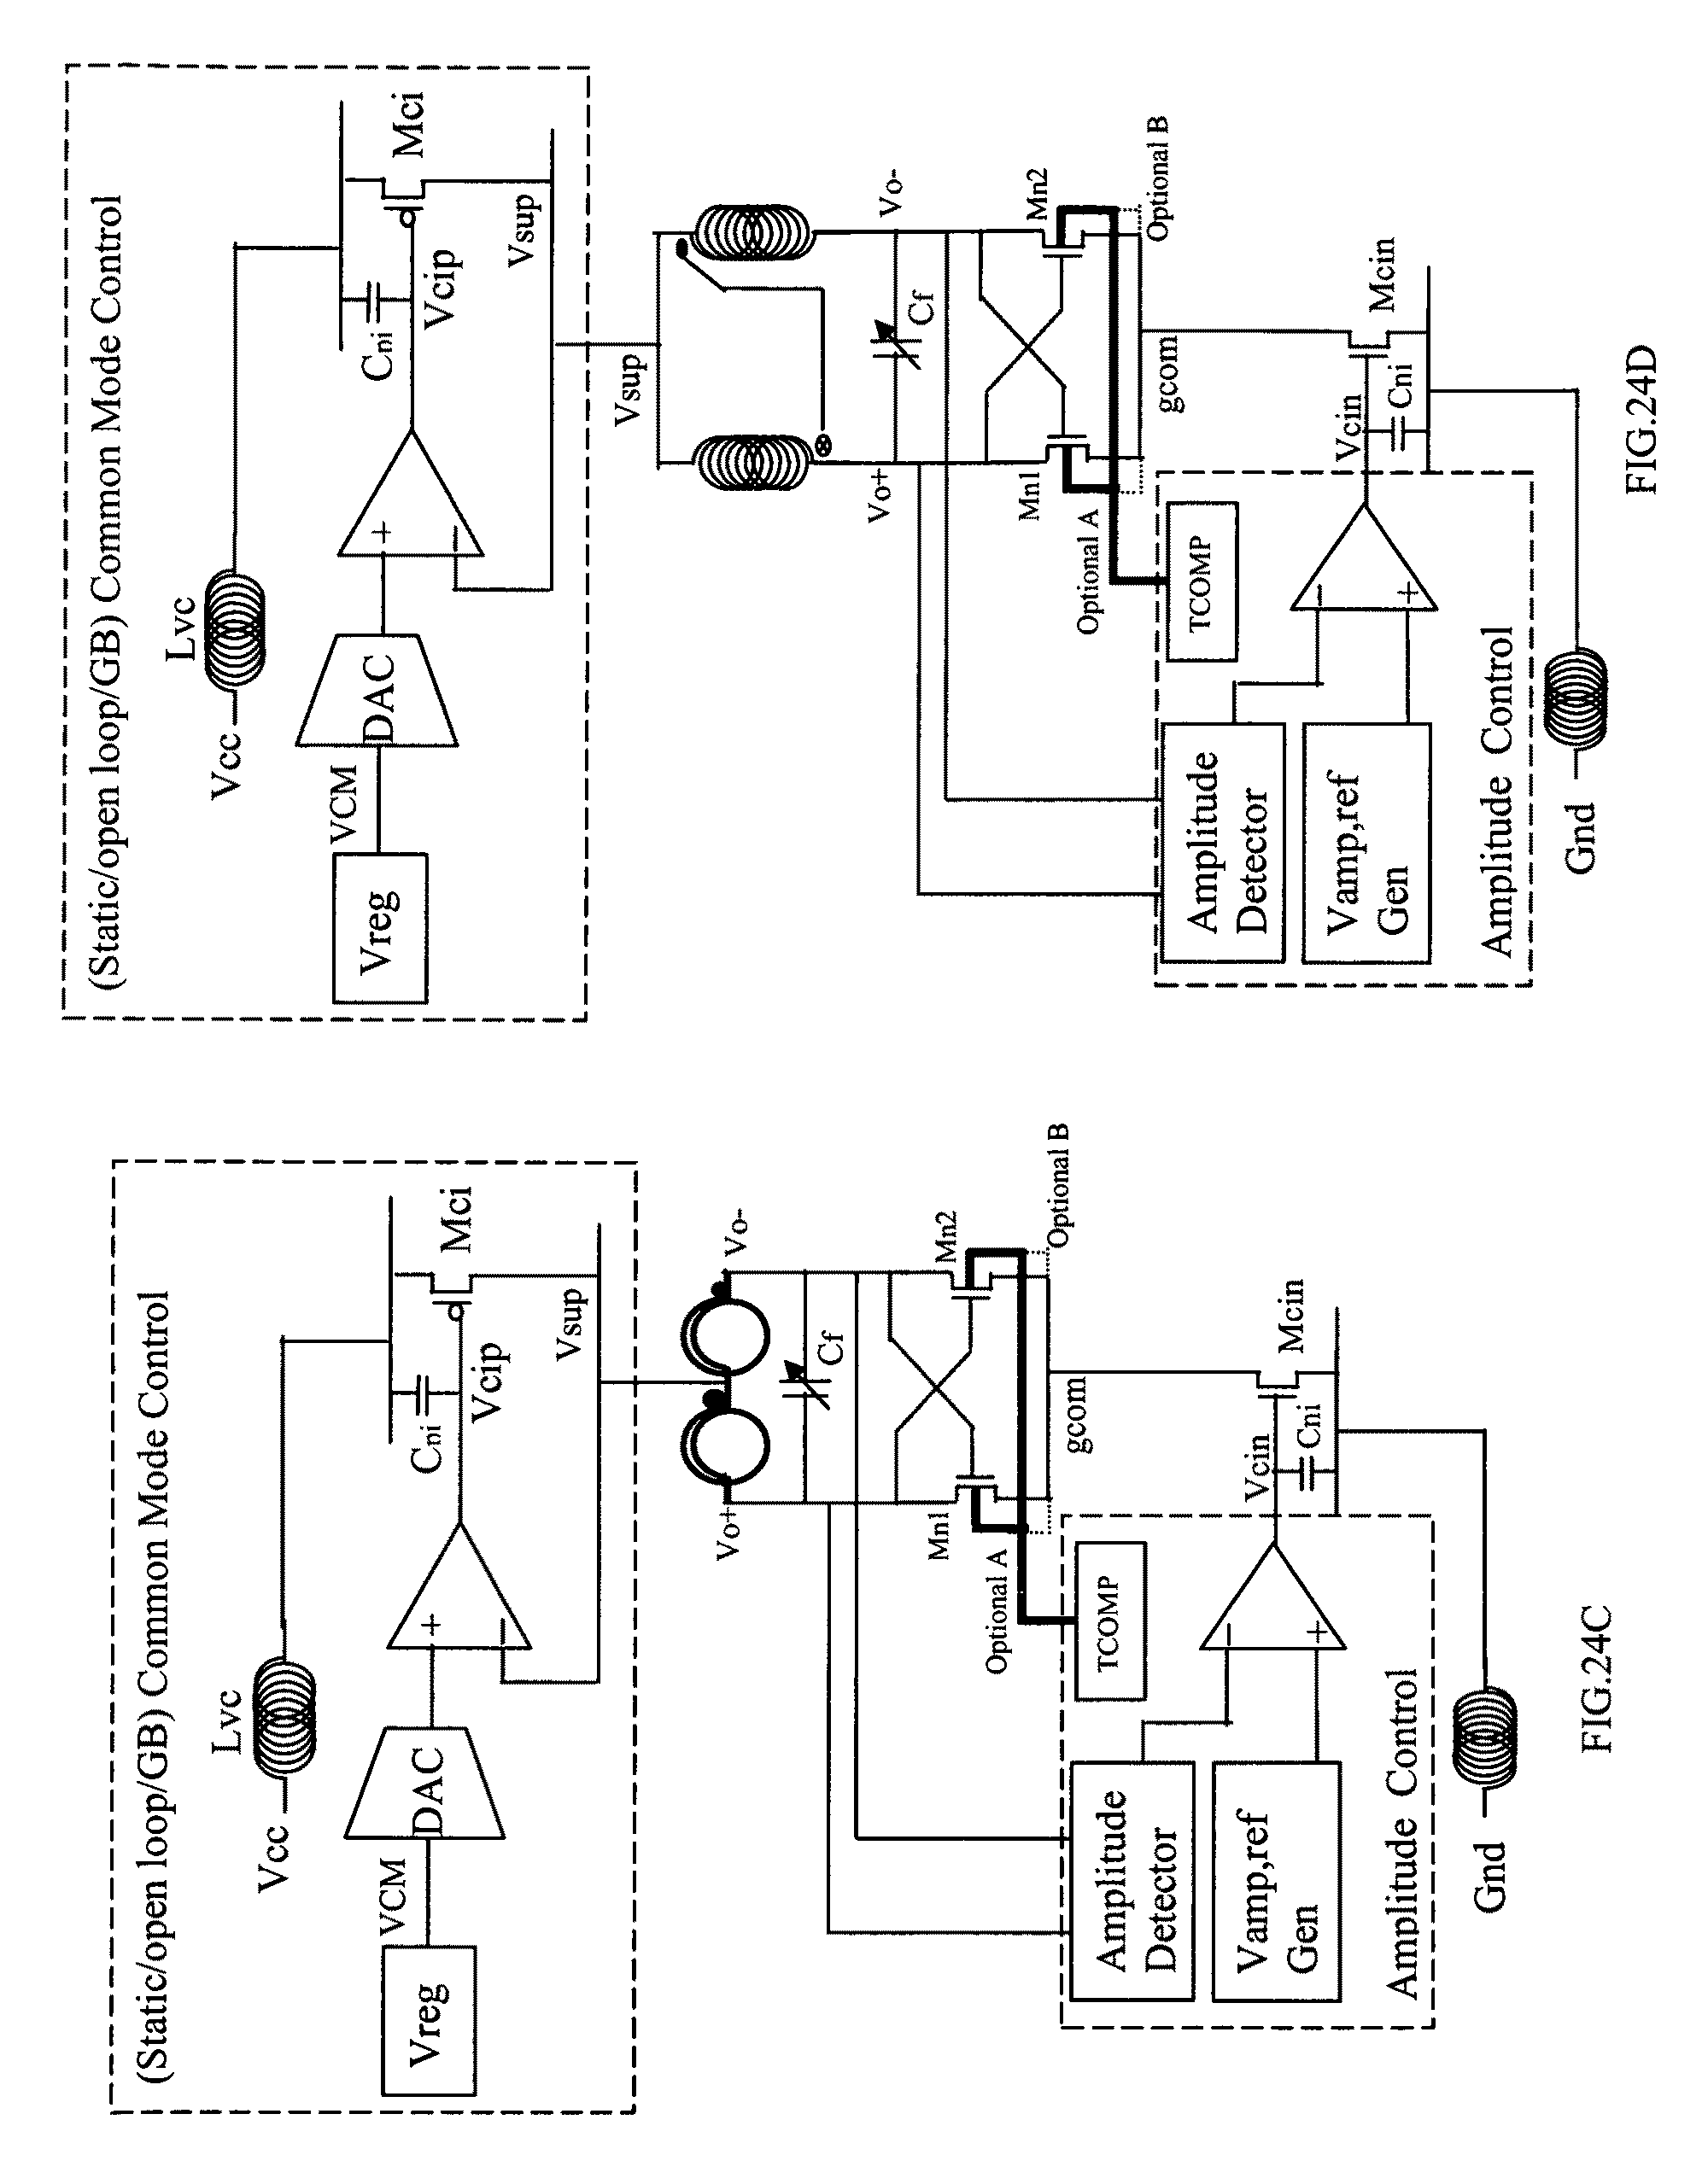 Patente Us8089324 Varactor Free Amplitude Controlled Oscillator Wireless Video Doorbell Circuit Basiccircuit Diagram Patent Drawing